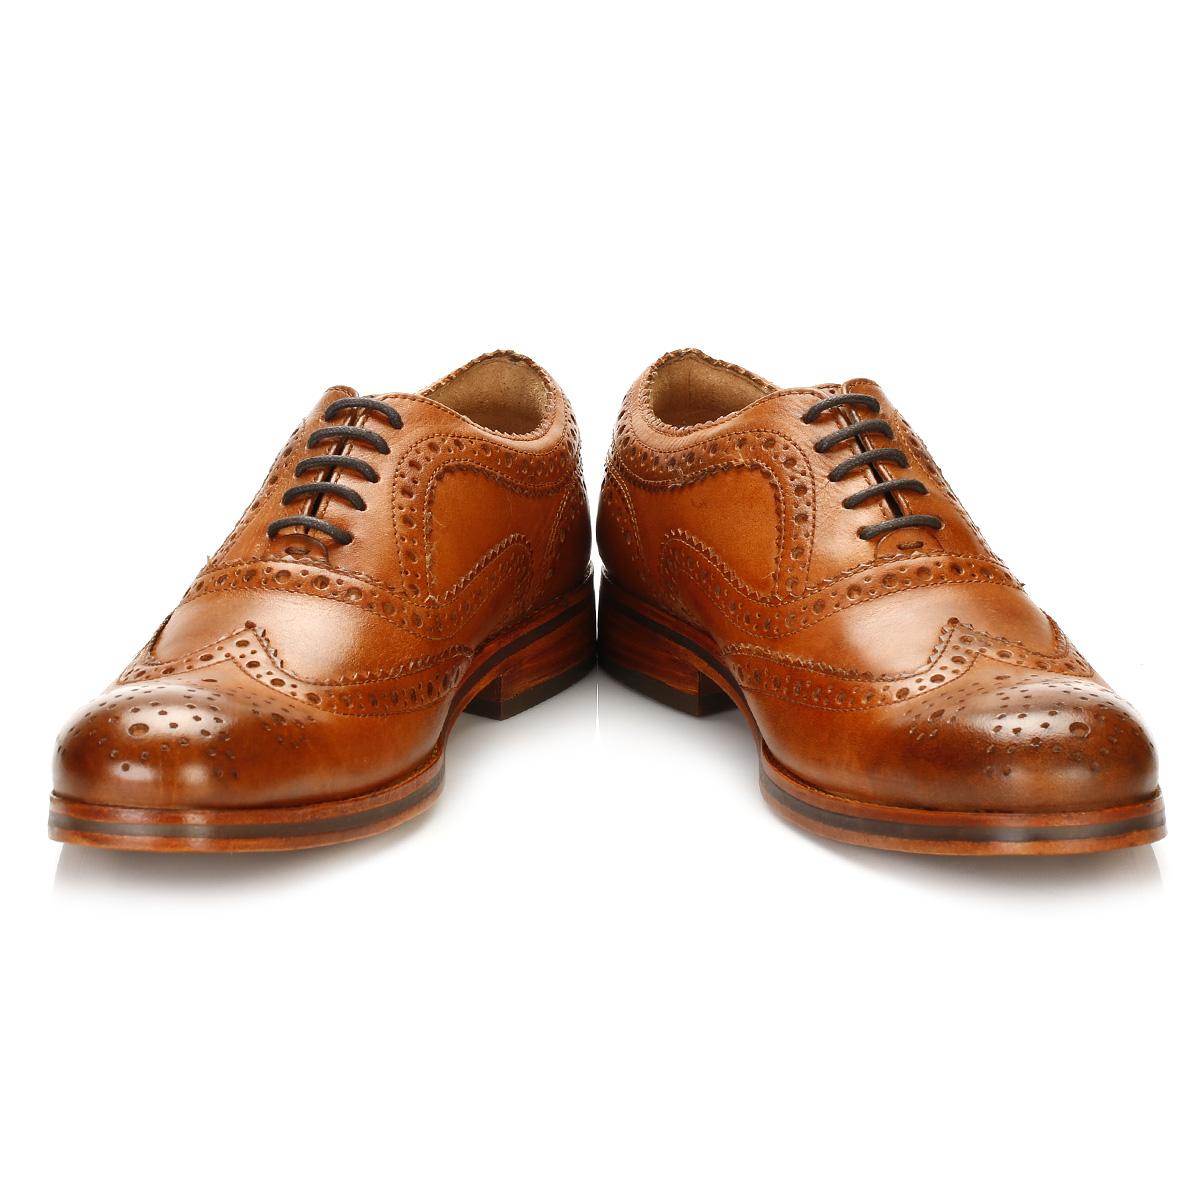 hudson mens brown oxford brogues wingtip leather smart